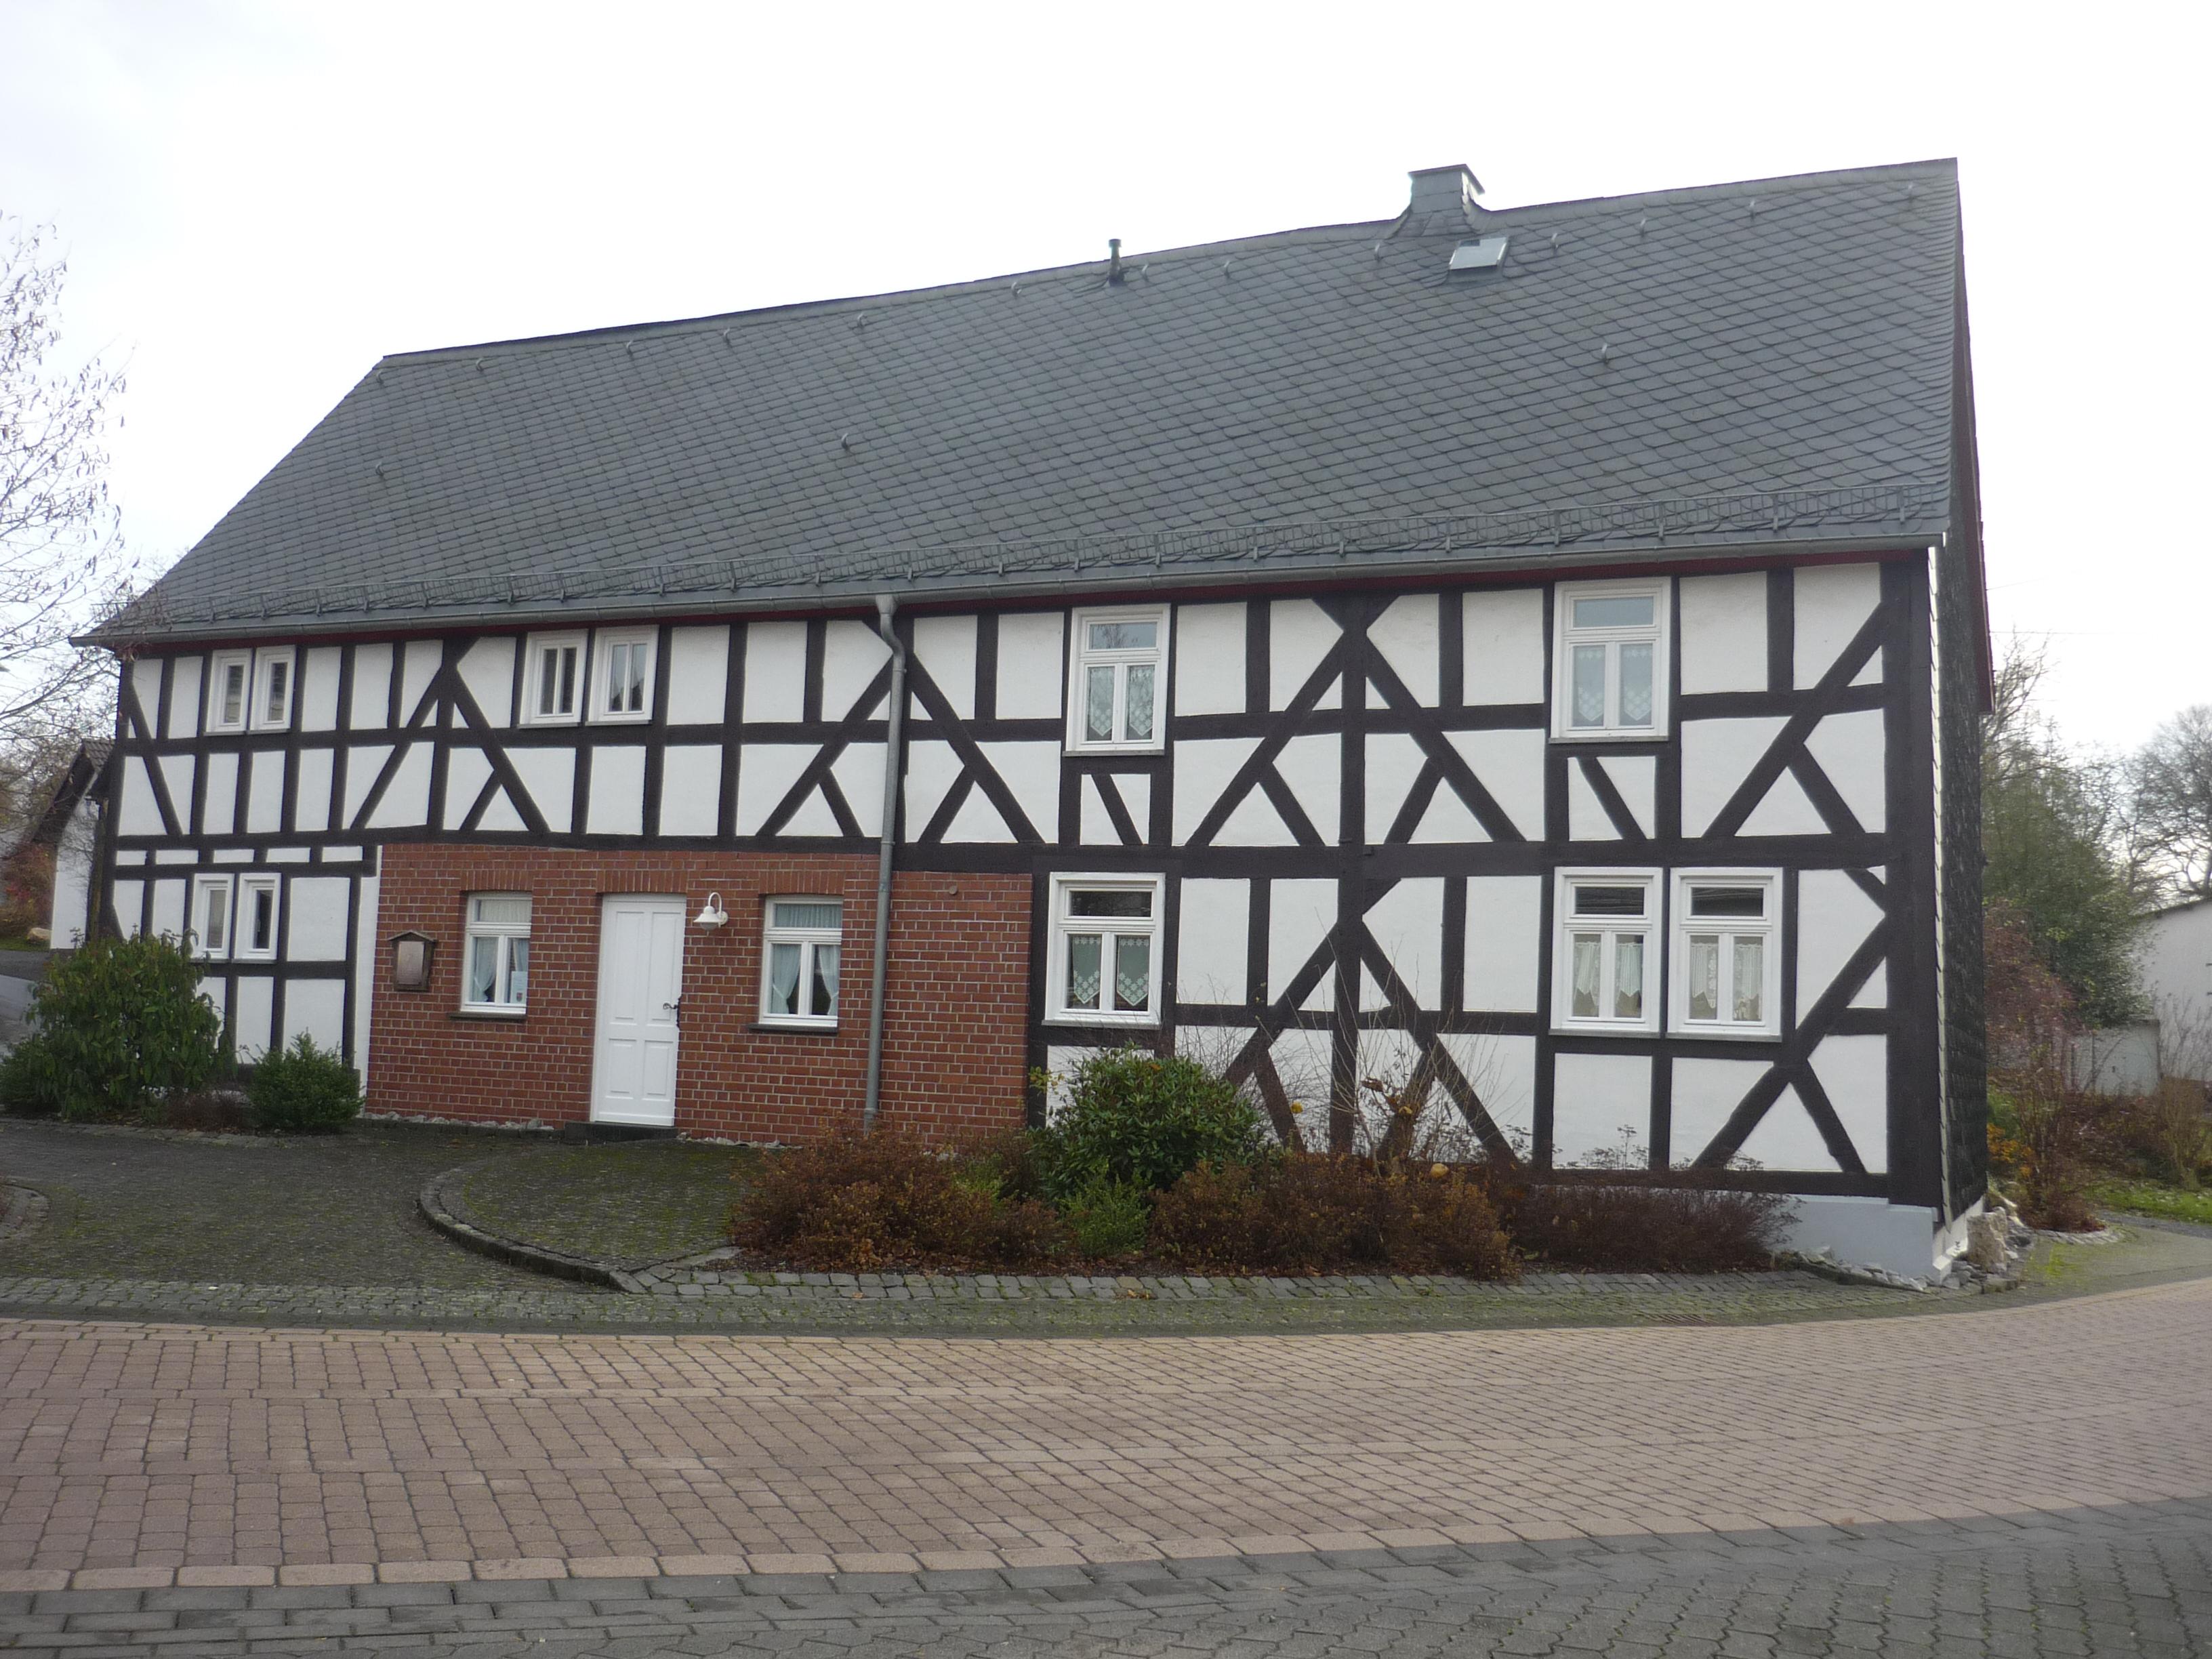 File:KroppacherSchweiz giesenhausen fachwerkhaus.jpg - Wikimedia Commons